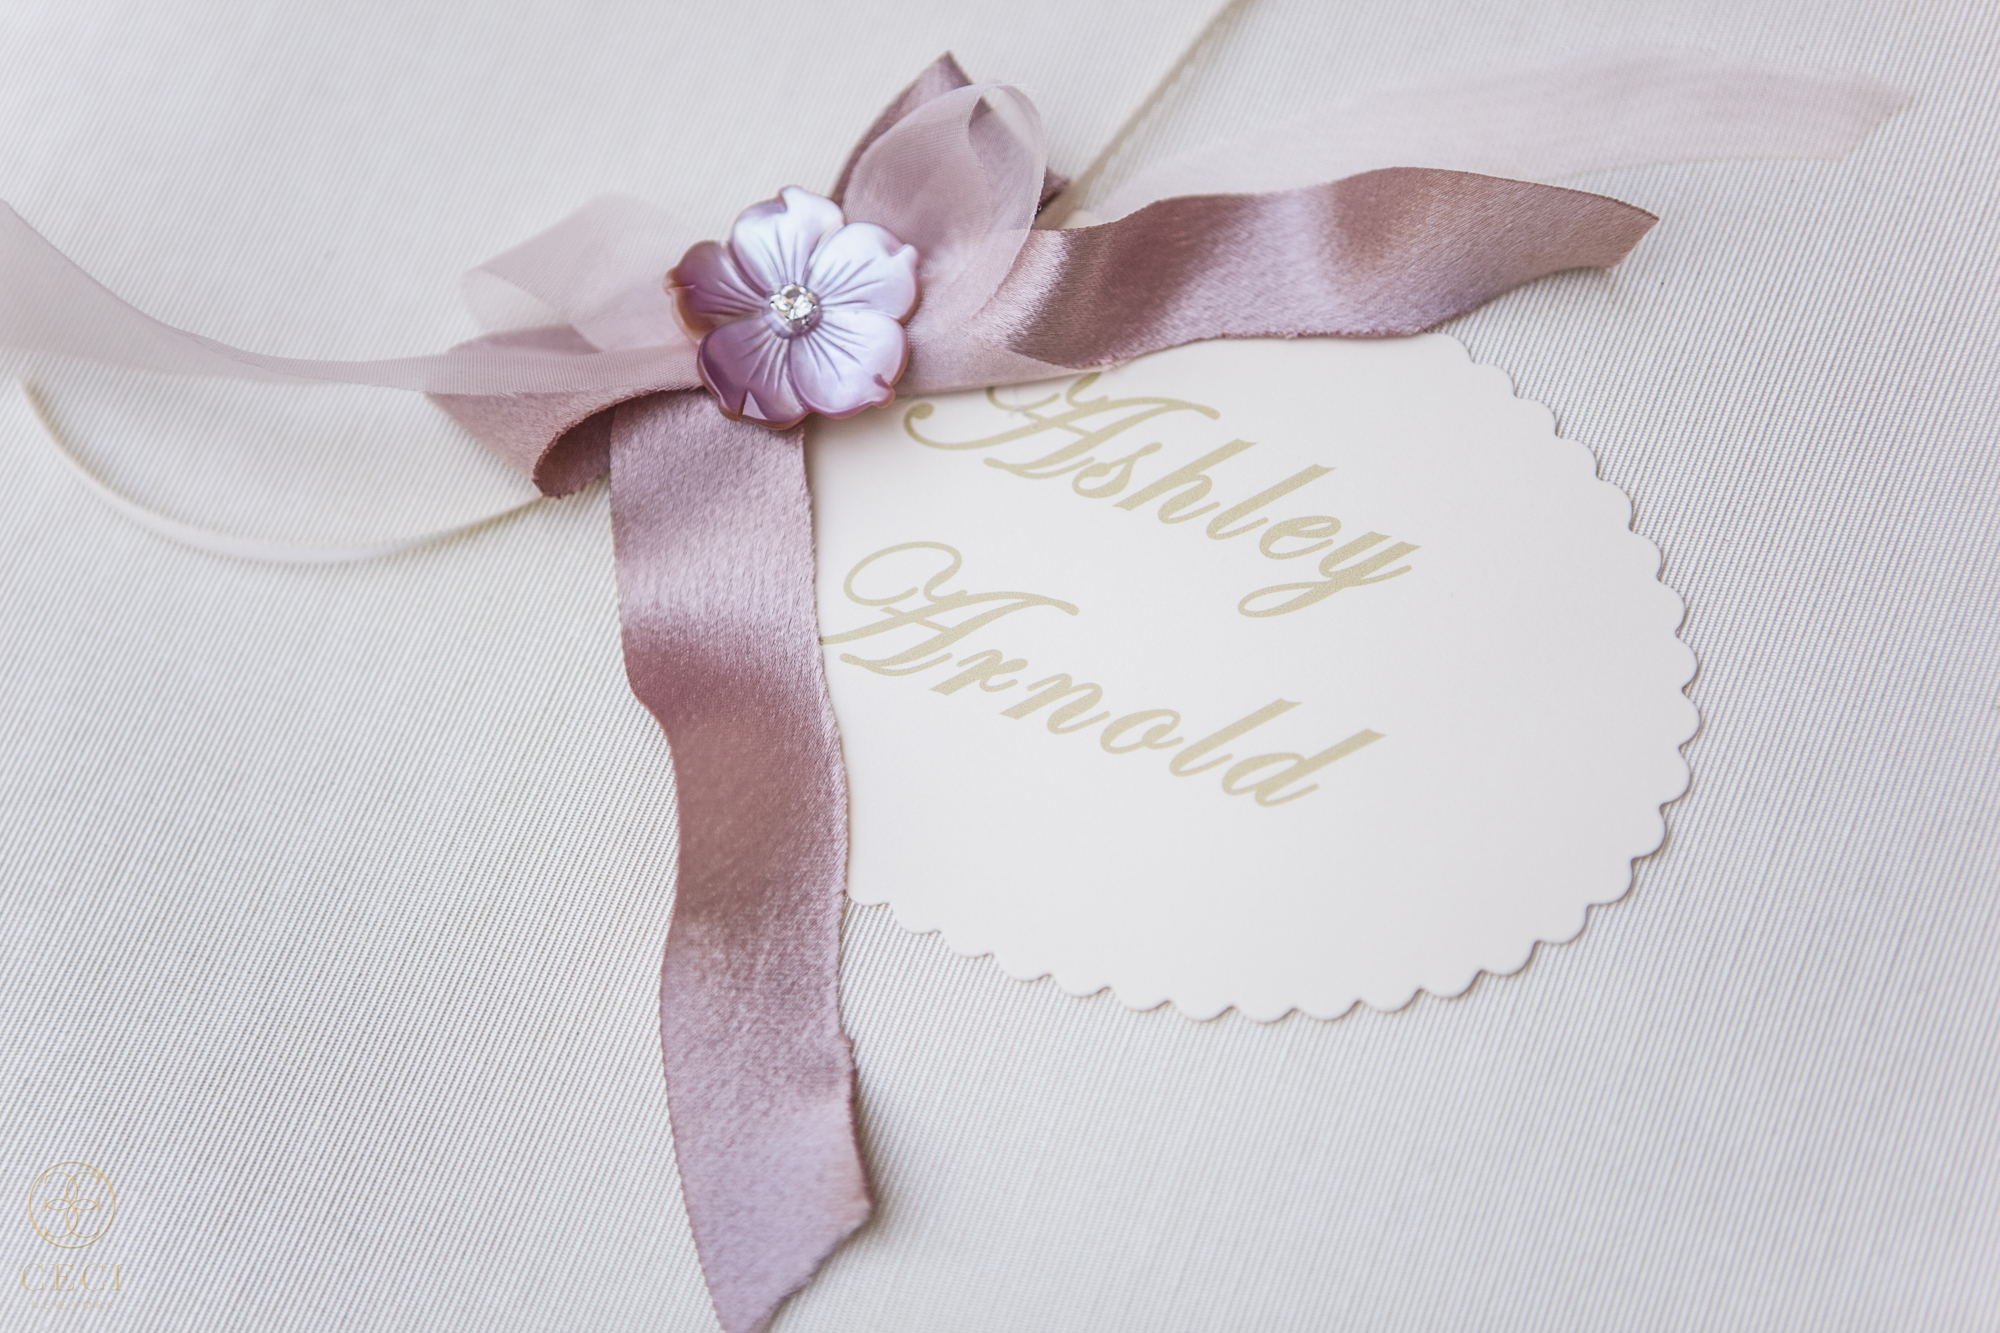 rose_gold_pink_romantic_real_wedding_roses_inspiration_cecinewyork_cecistyle_v152_1-11.jpg